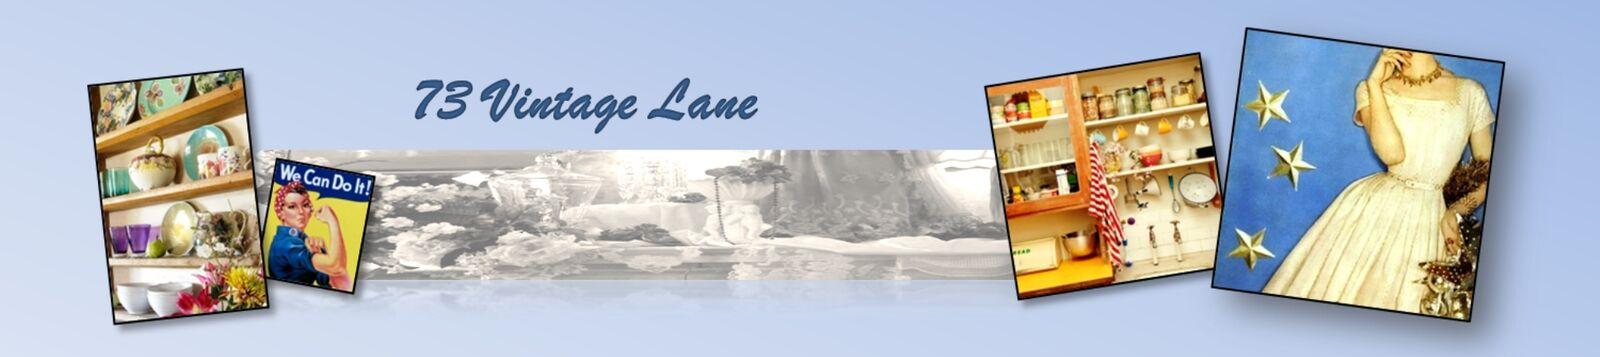 73_Vintage_Lane